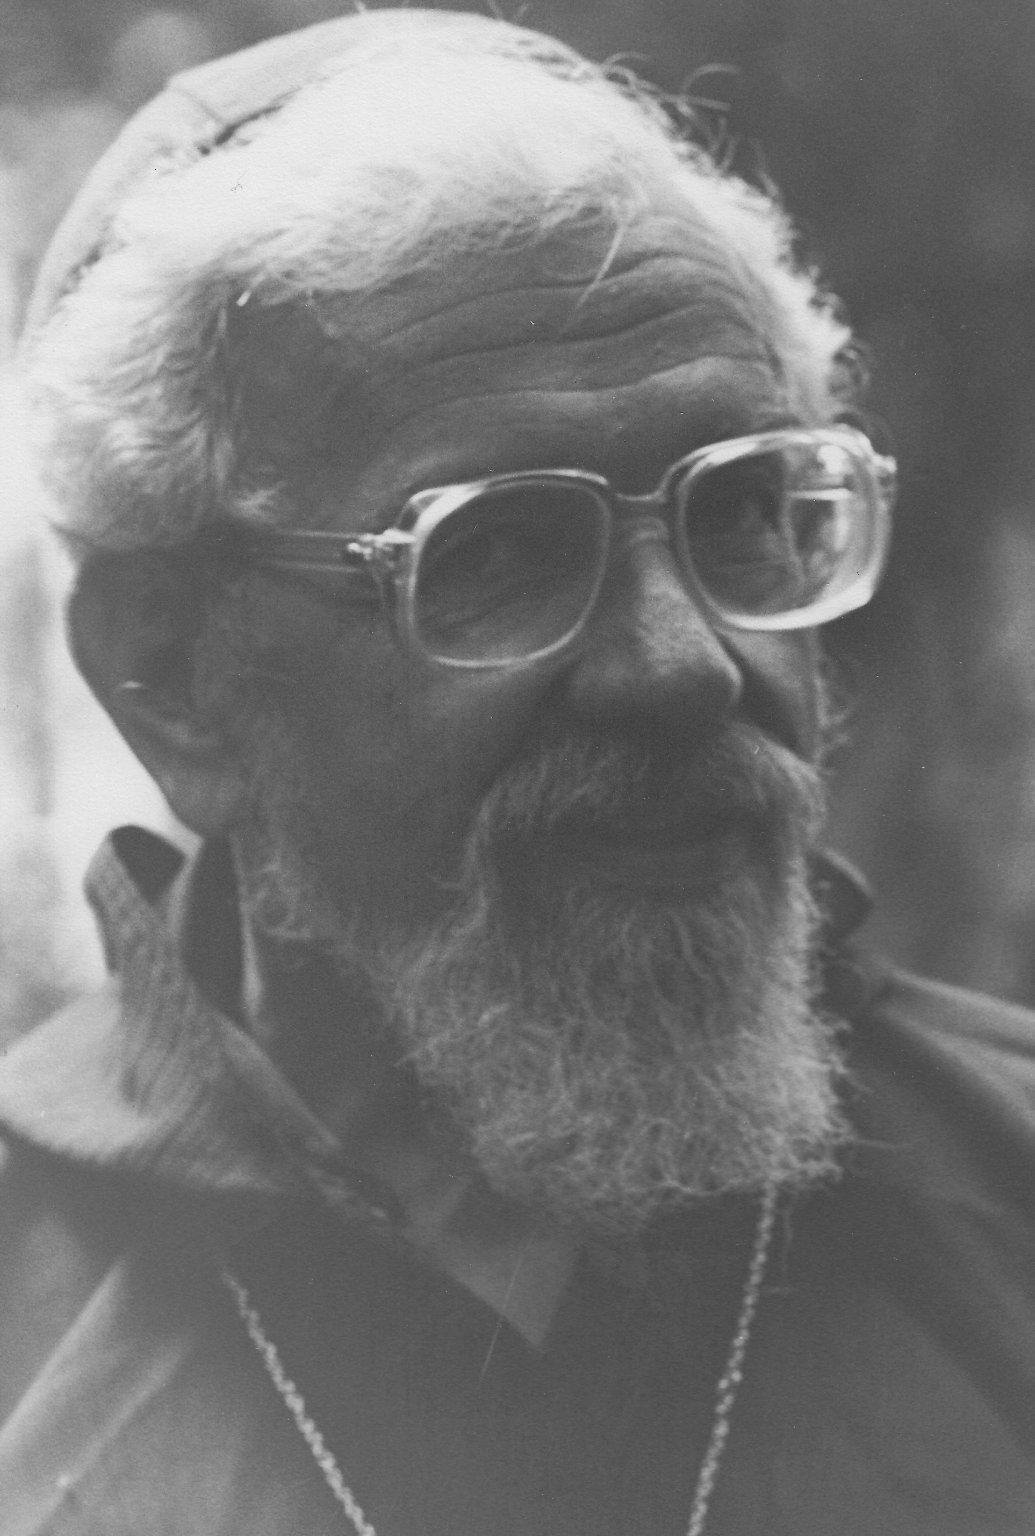 Rabbi Zalman Schachter-Shalomi in sheikh's robe, ca. 1980s.